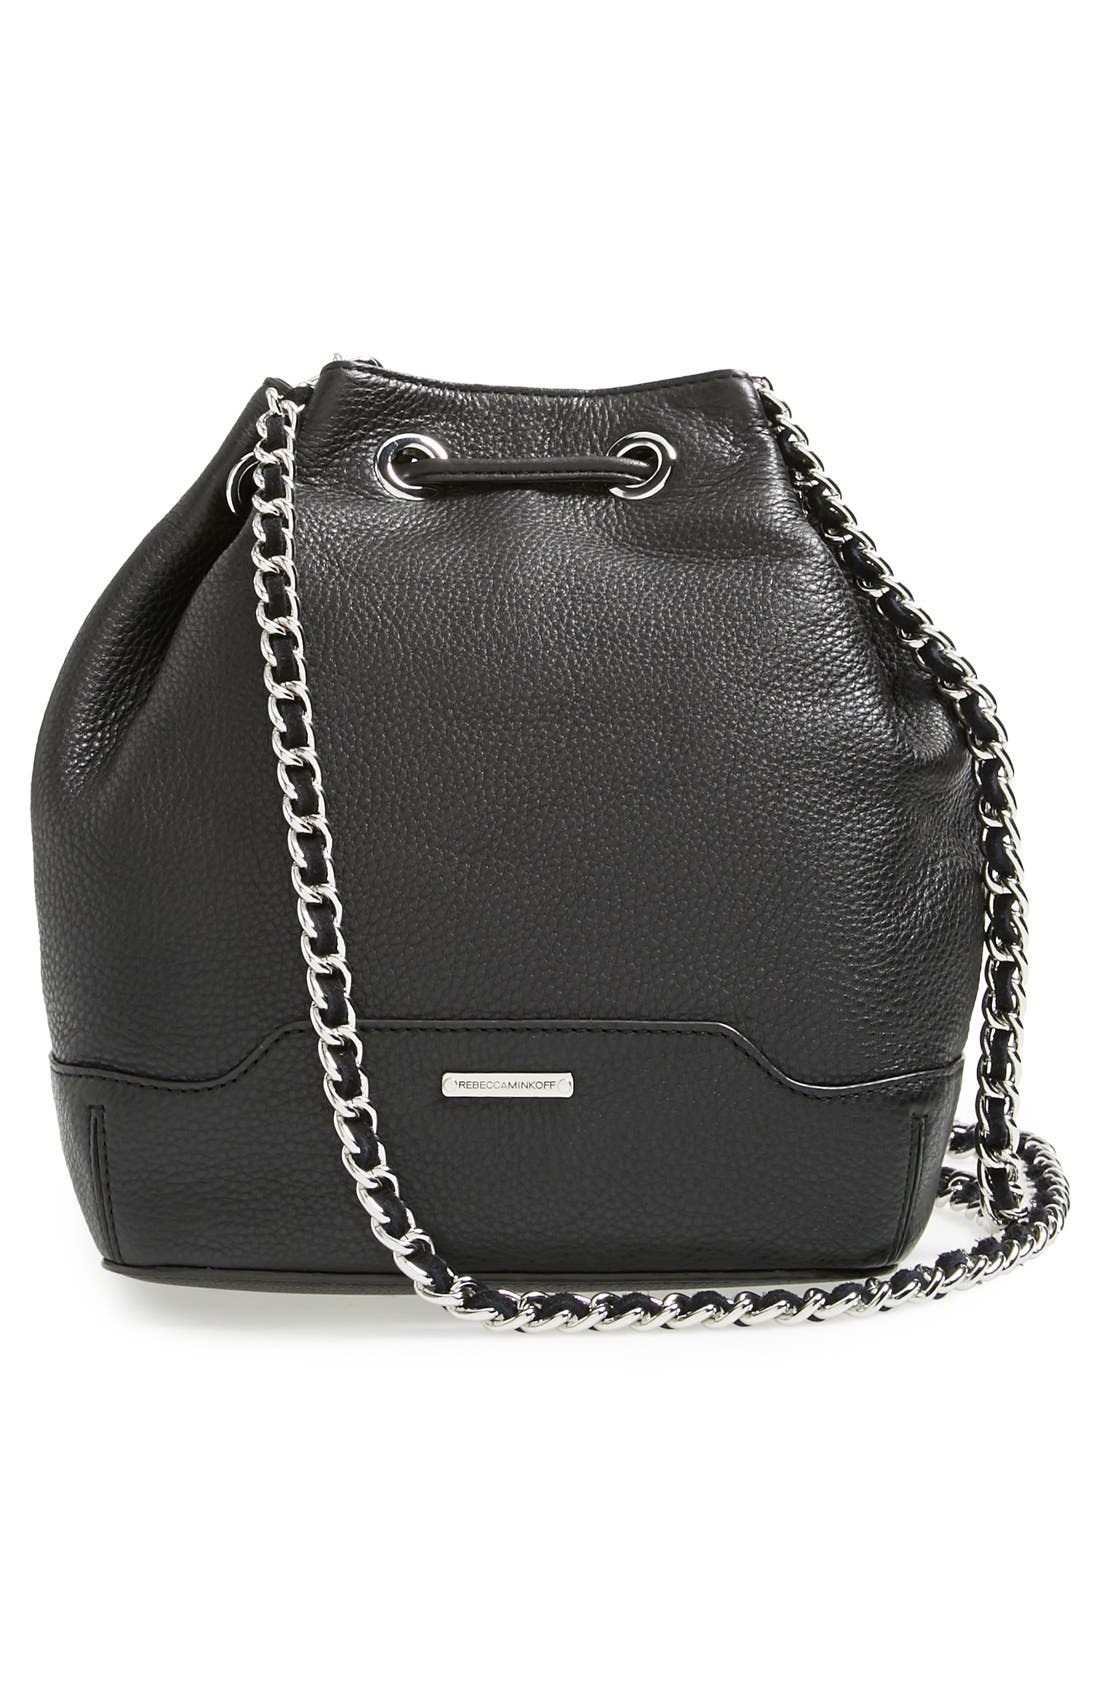 Alternate Image 3  - Rebecca Minkoff 'Lexi' Convertible Bucket Bag